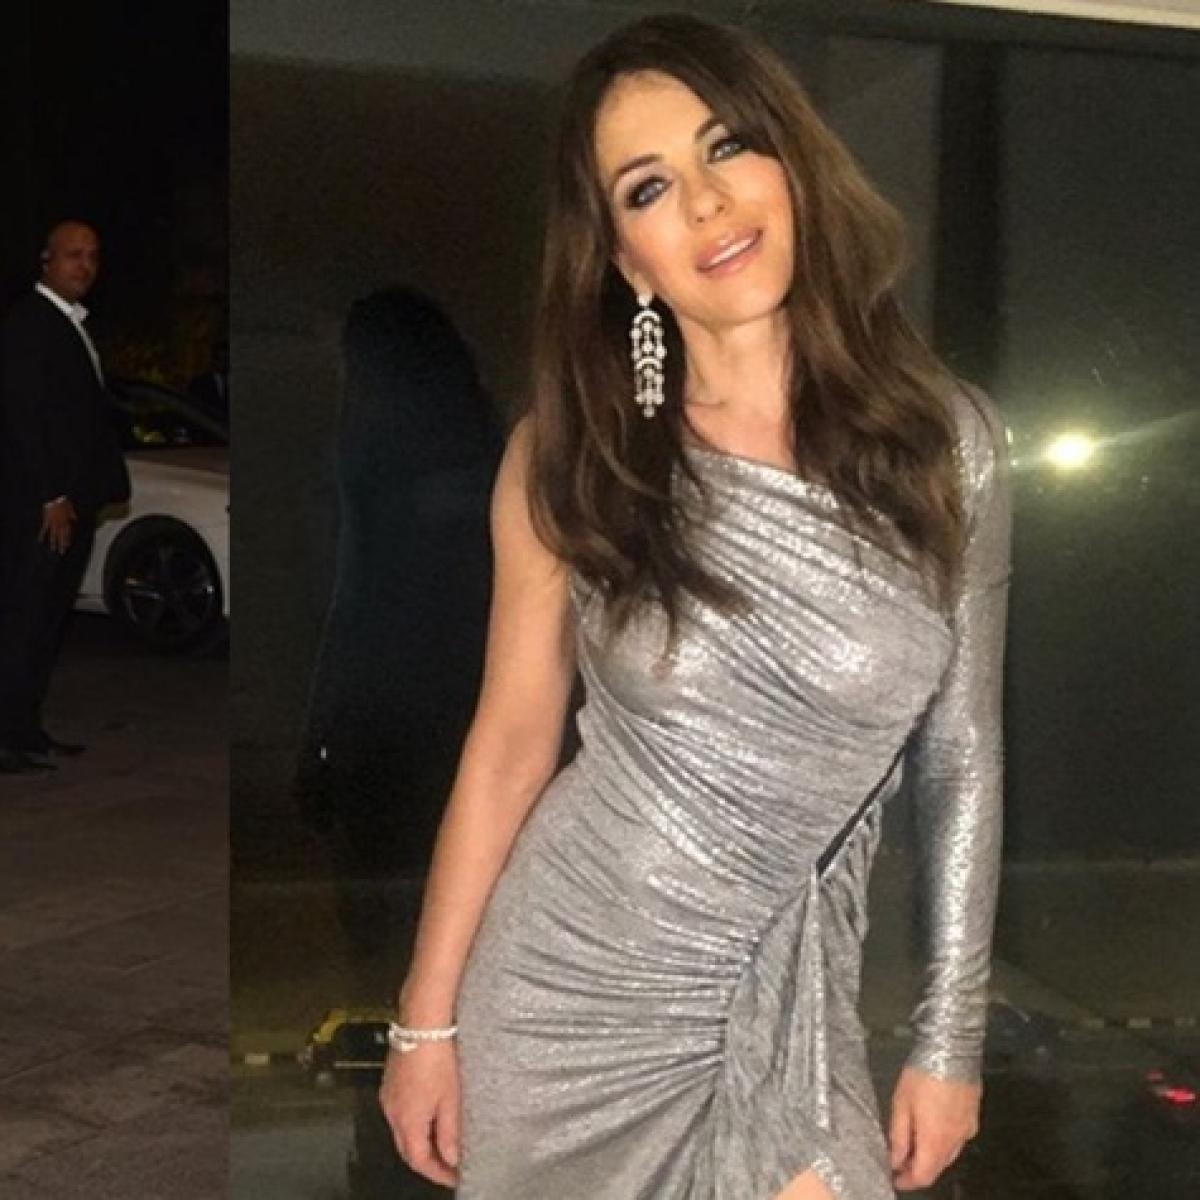 Elizabeth Hurley spotted at Armaan Jain's wedding reception in a sexy silver bodycon dress